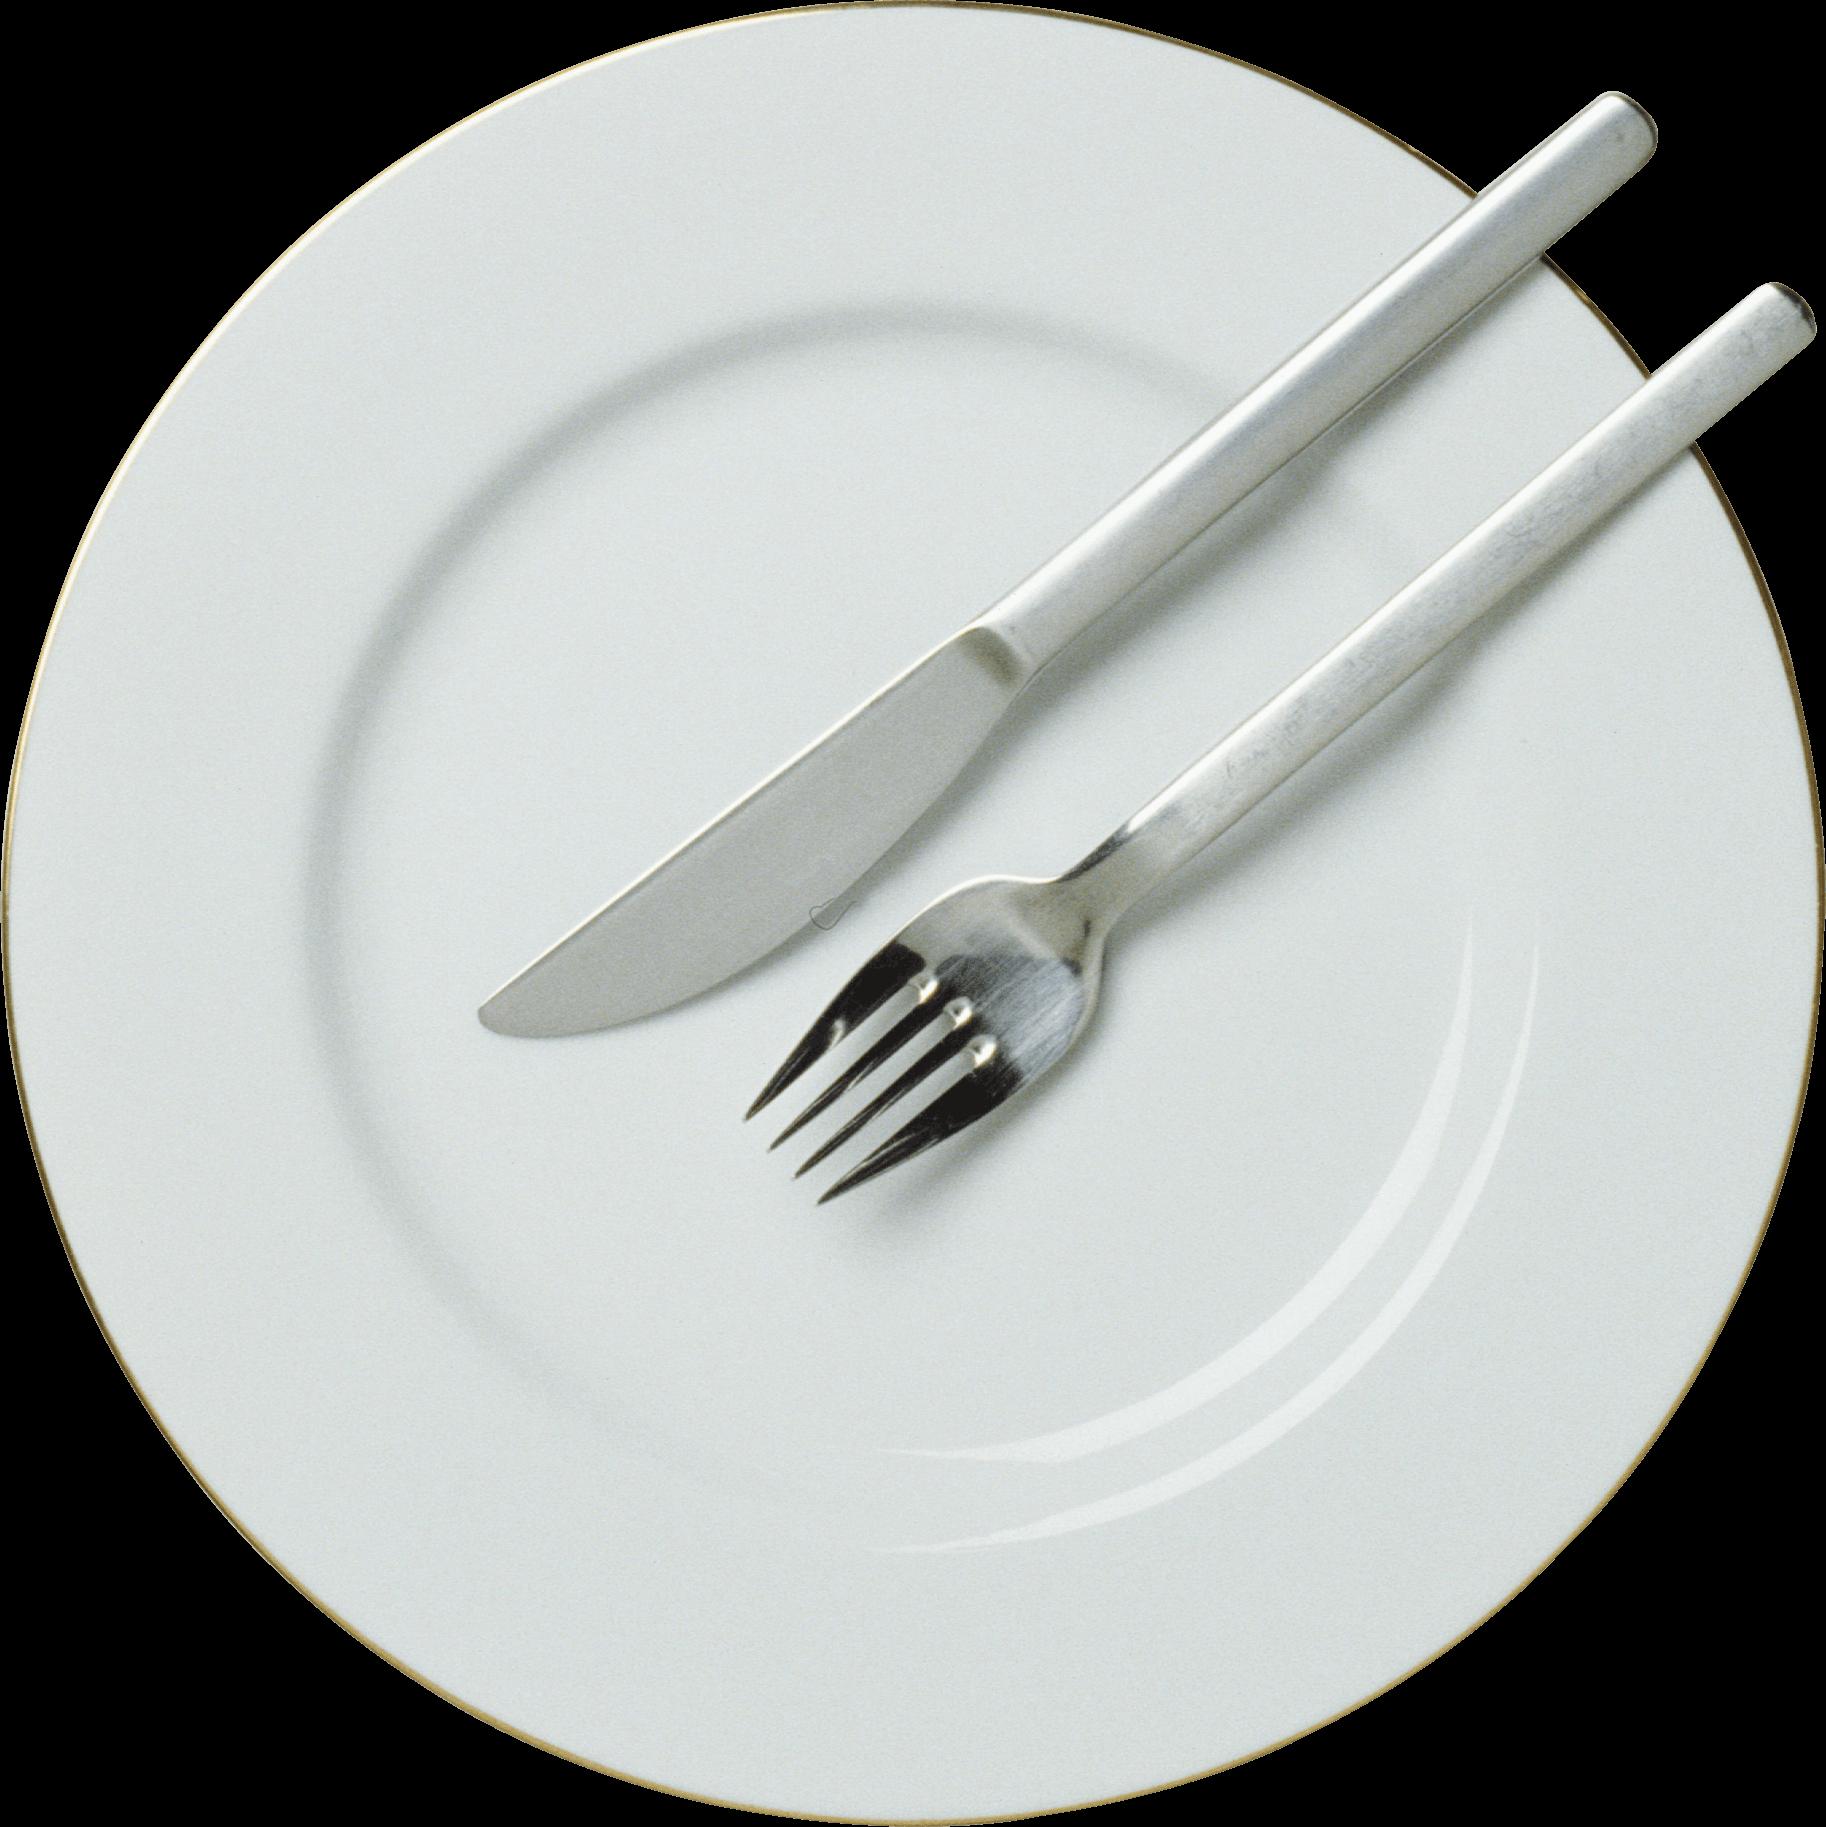 Fork fork knife